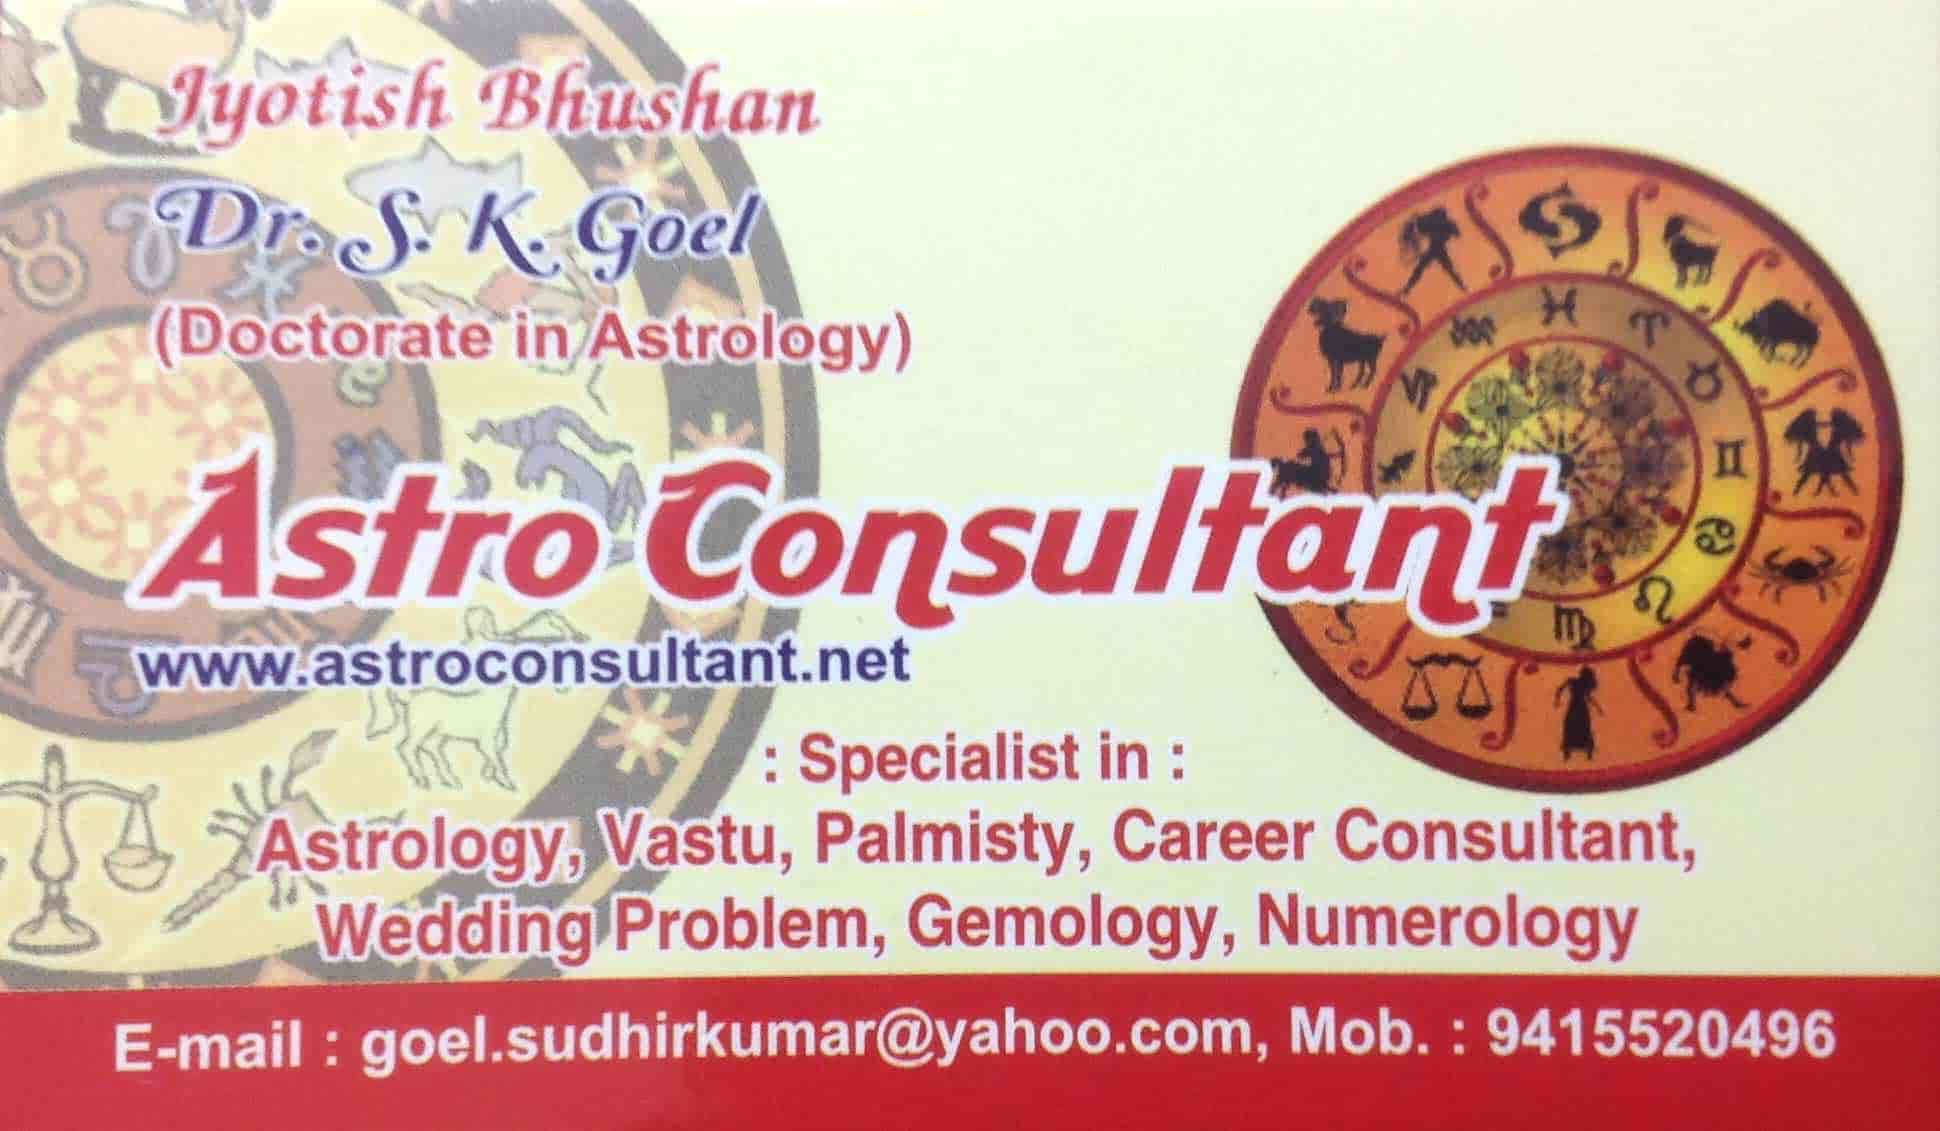 astrology business cards - Ideal.vistalist.co